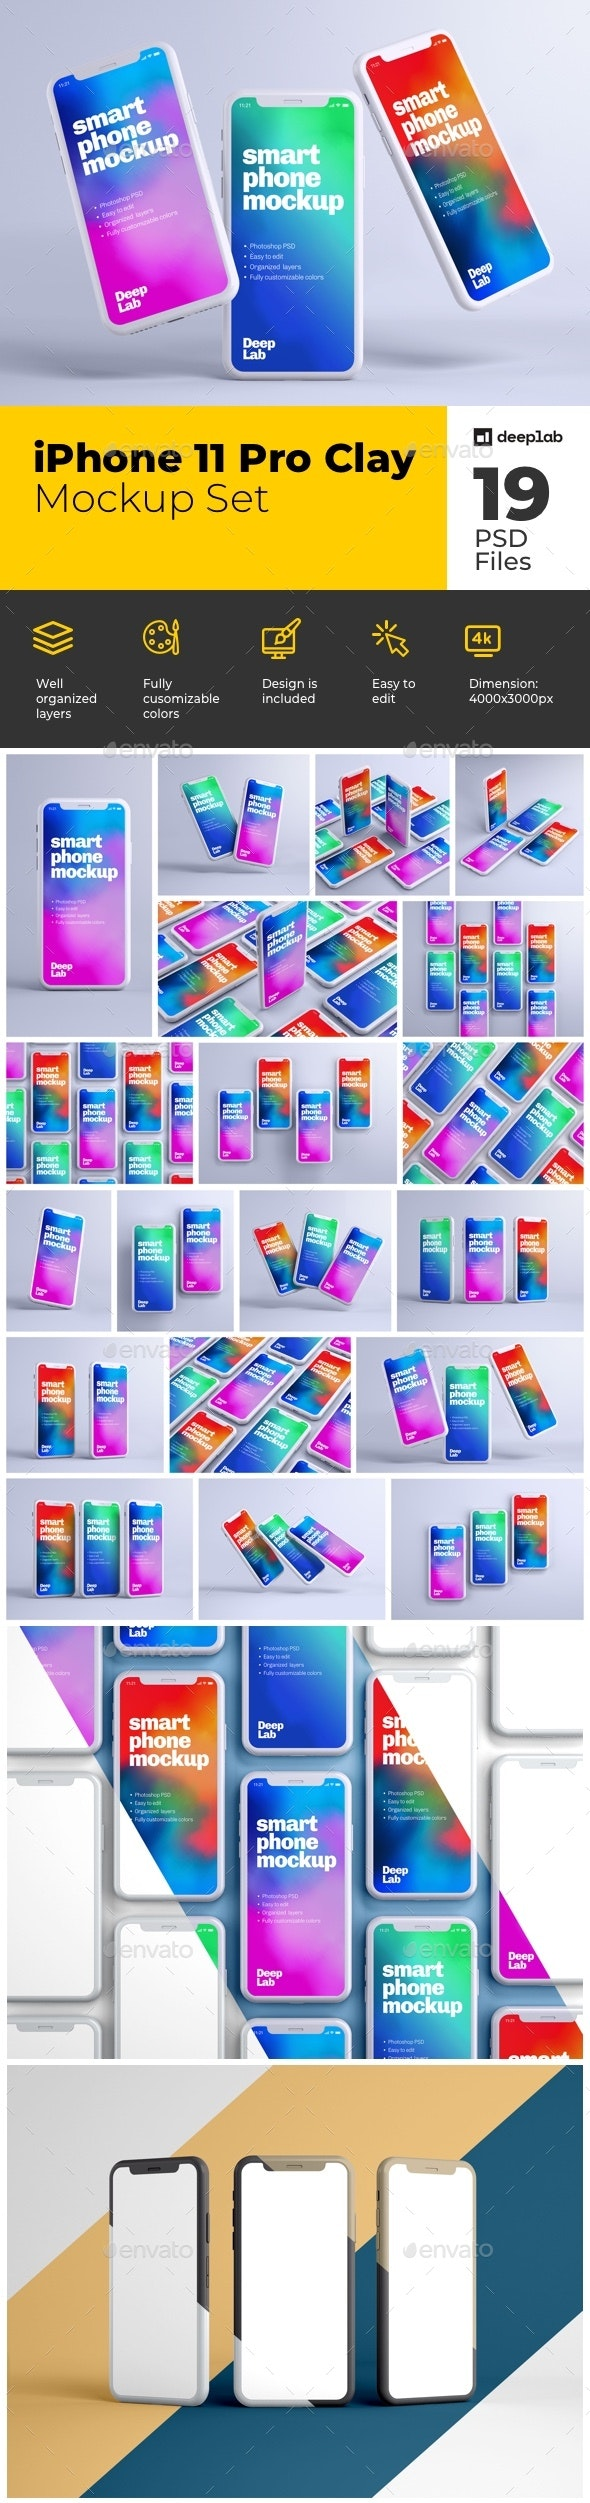 iPhone 11 Pro Clay Mockup Set